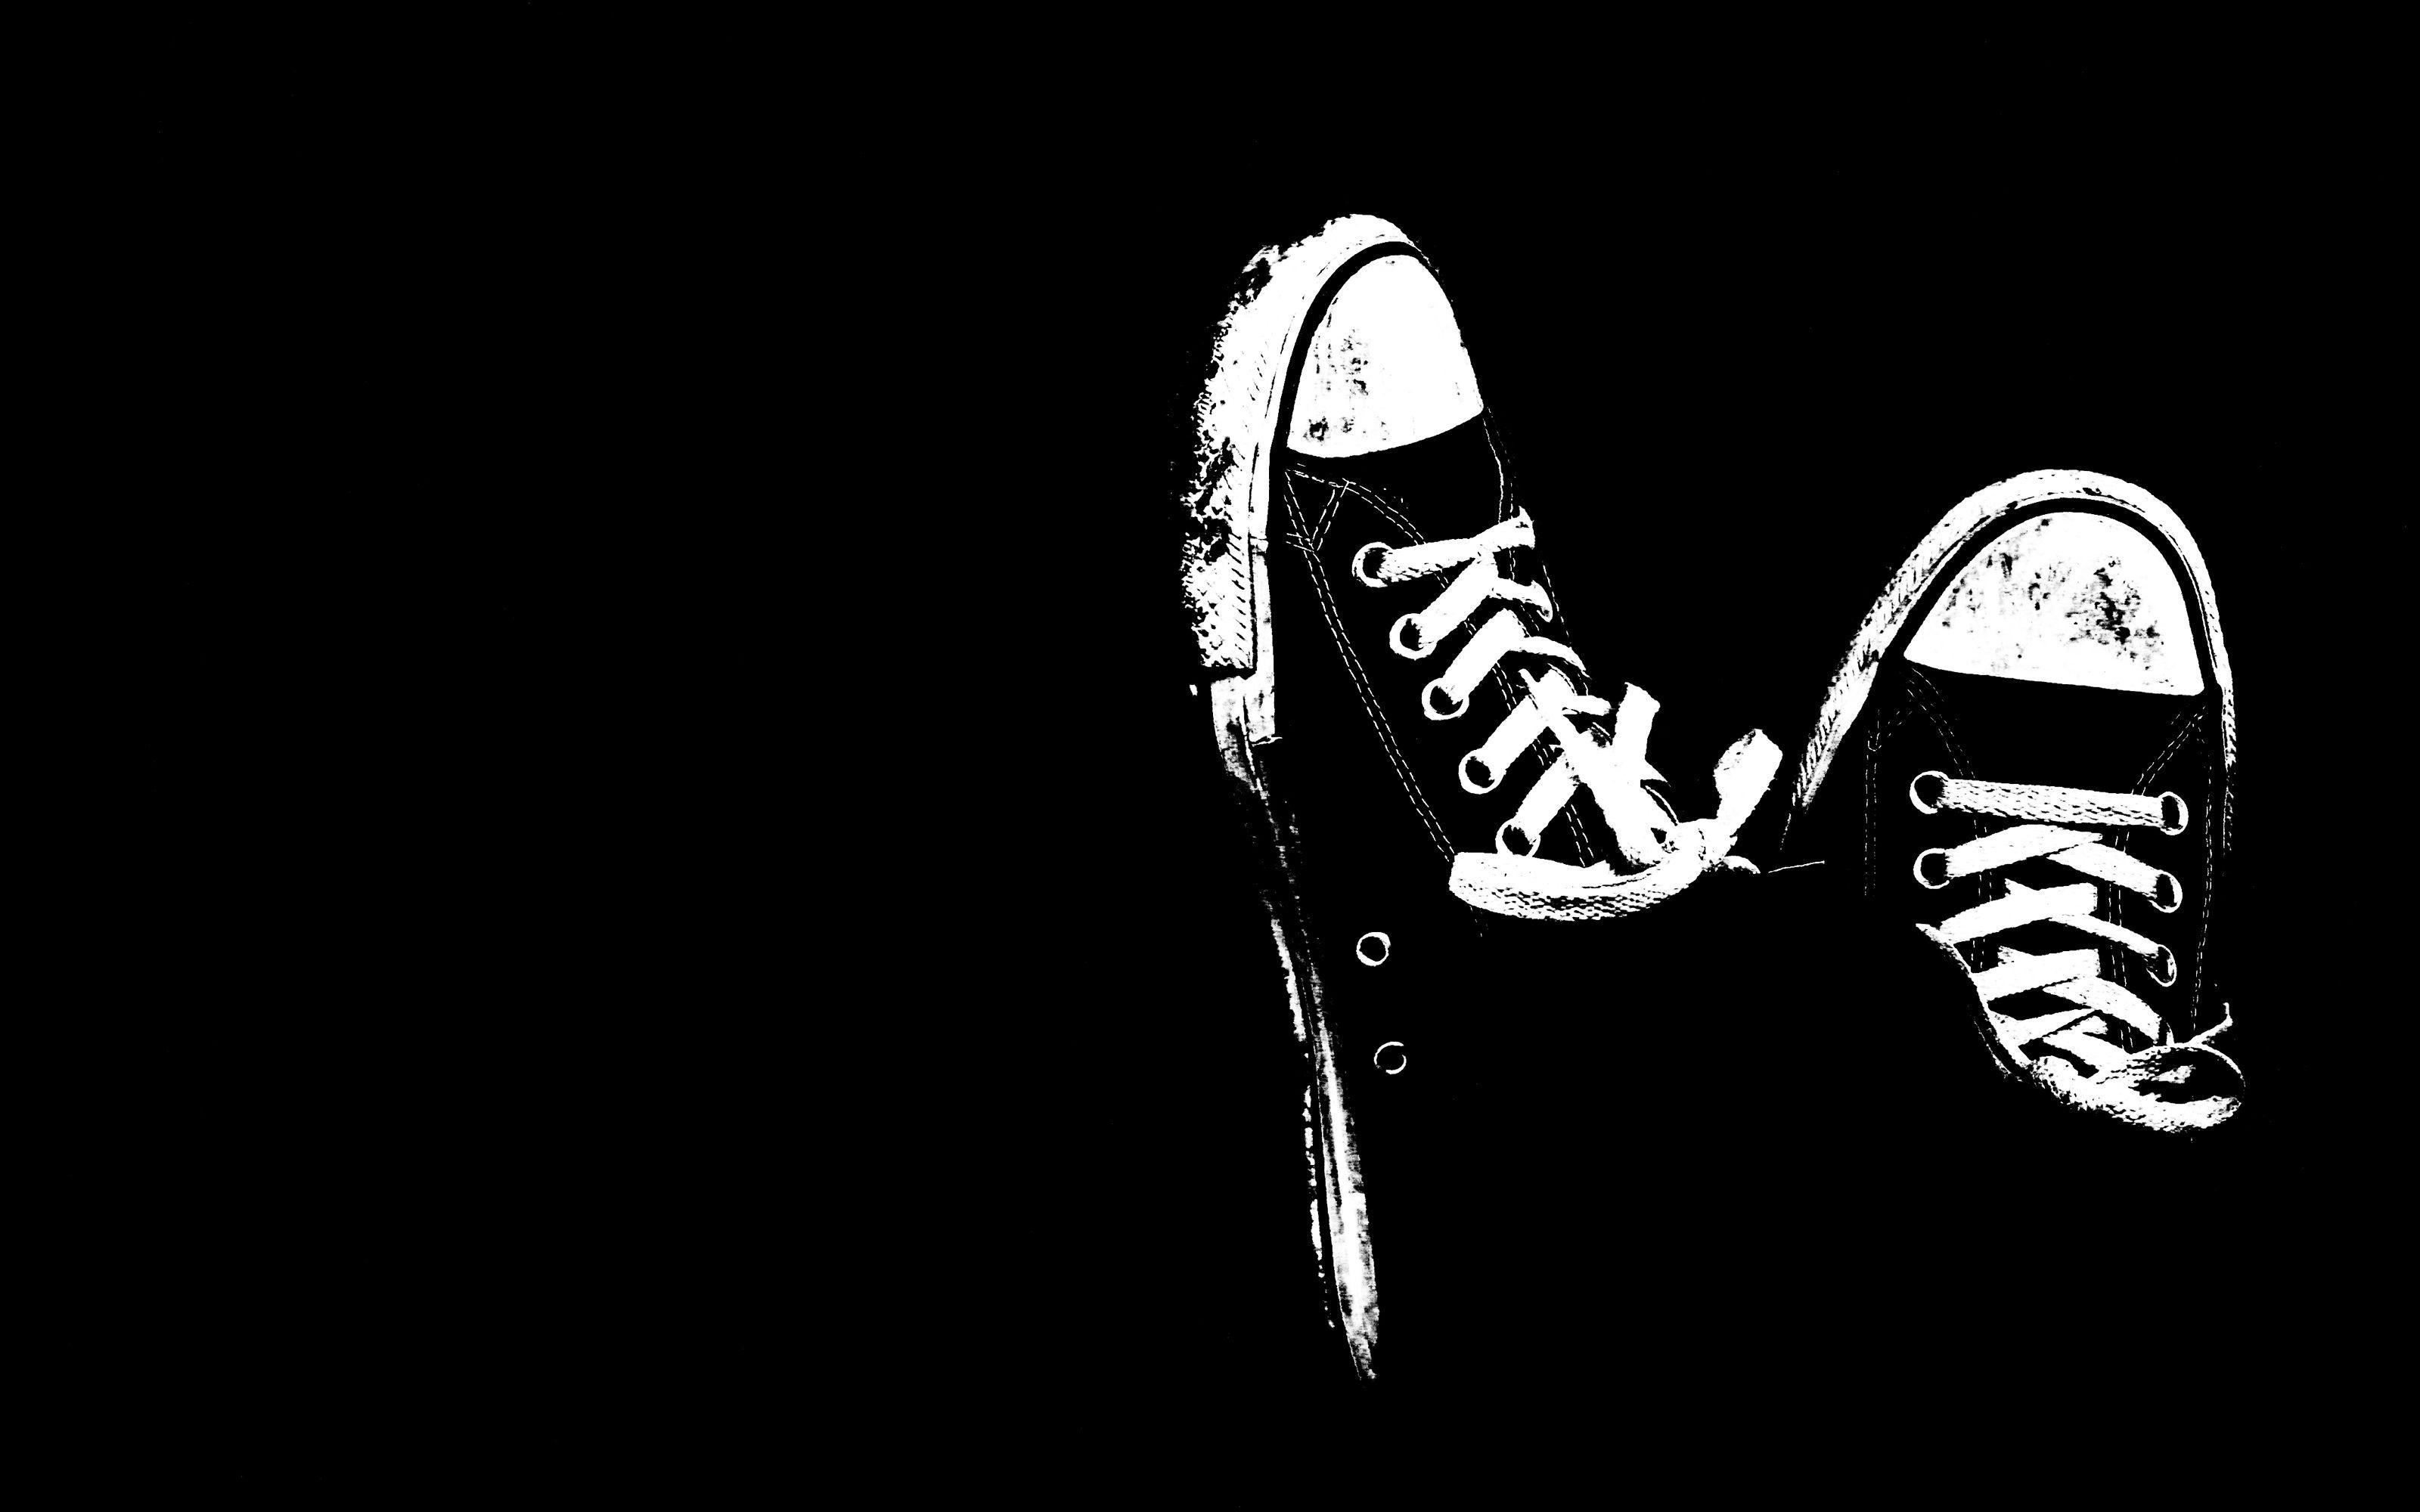 Hd Amazon Back Cool Desktop Wallpaper Hd Art Hd 3d Nature Butterfly Dwonload Hd Animated 3d Hd 2013 Black Hd Wallpaper Black And White Shoes Shoes Wallpaper